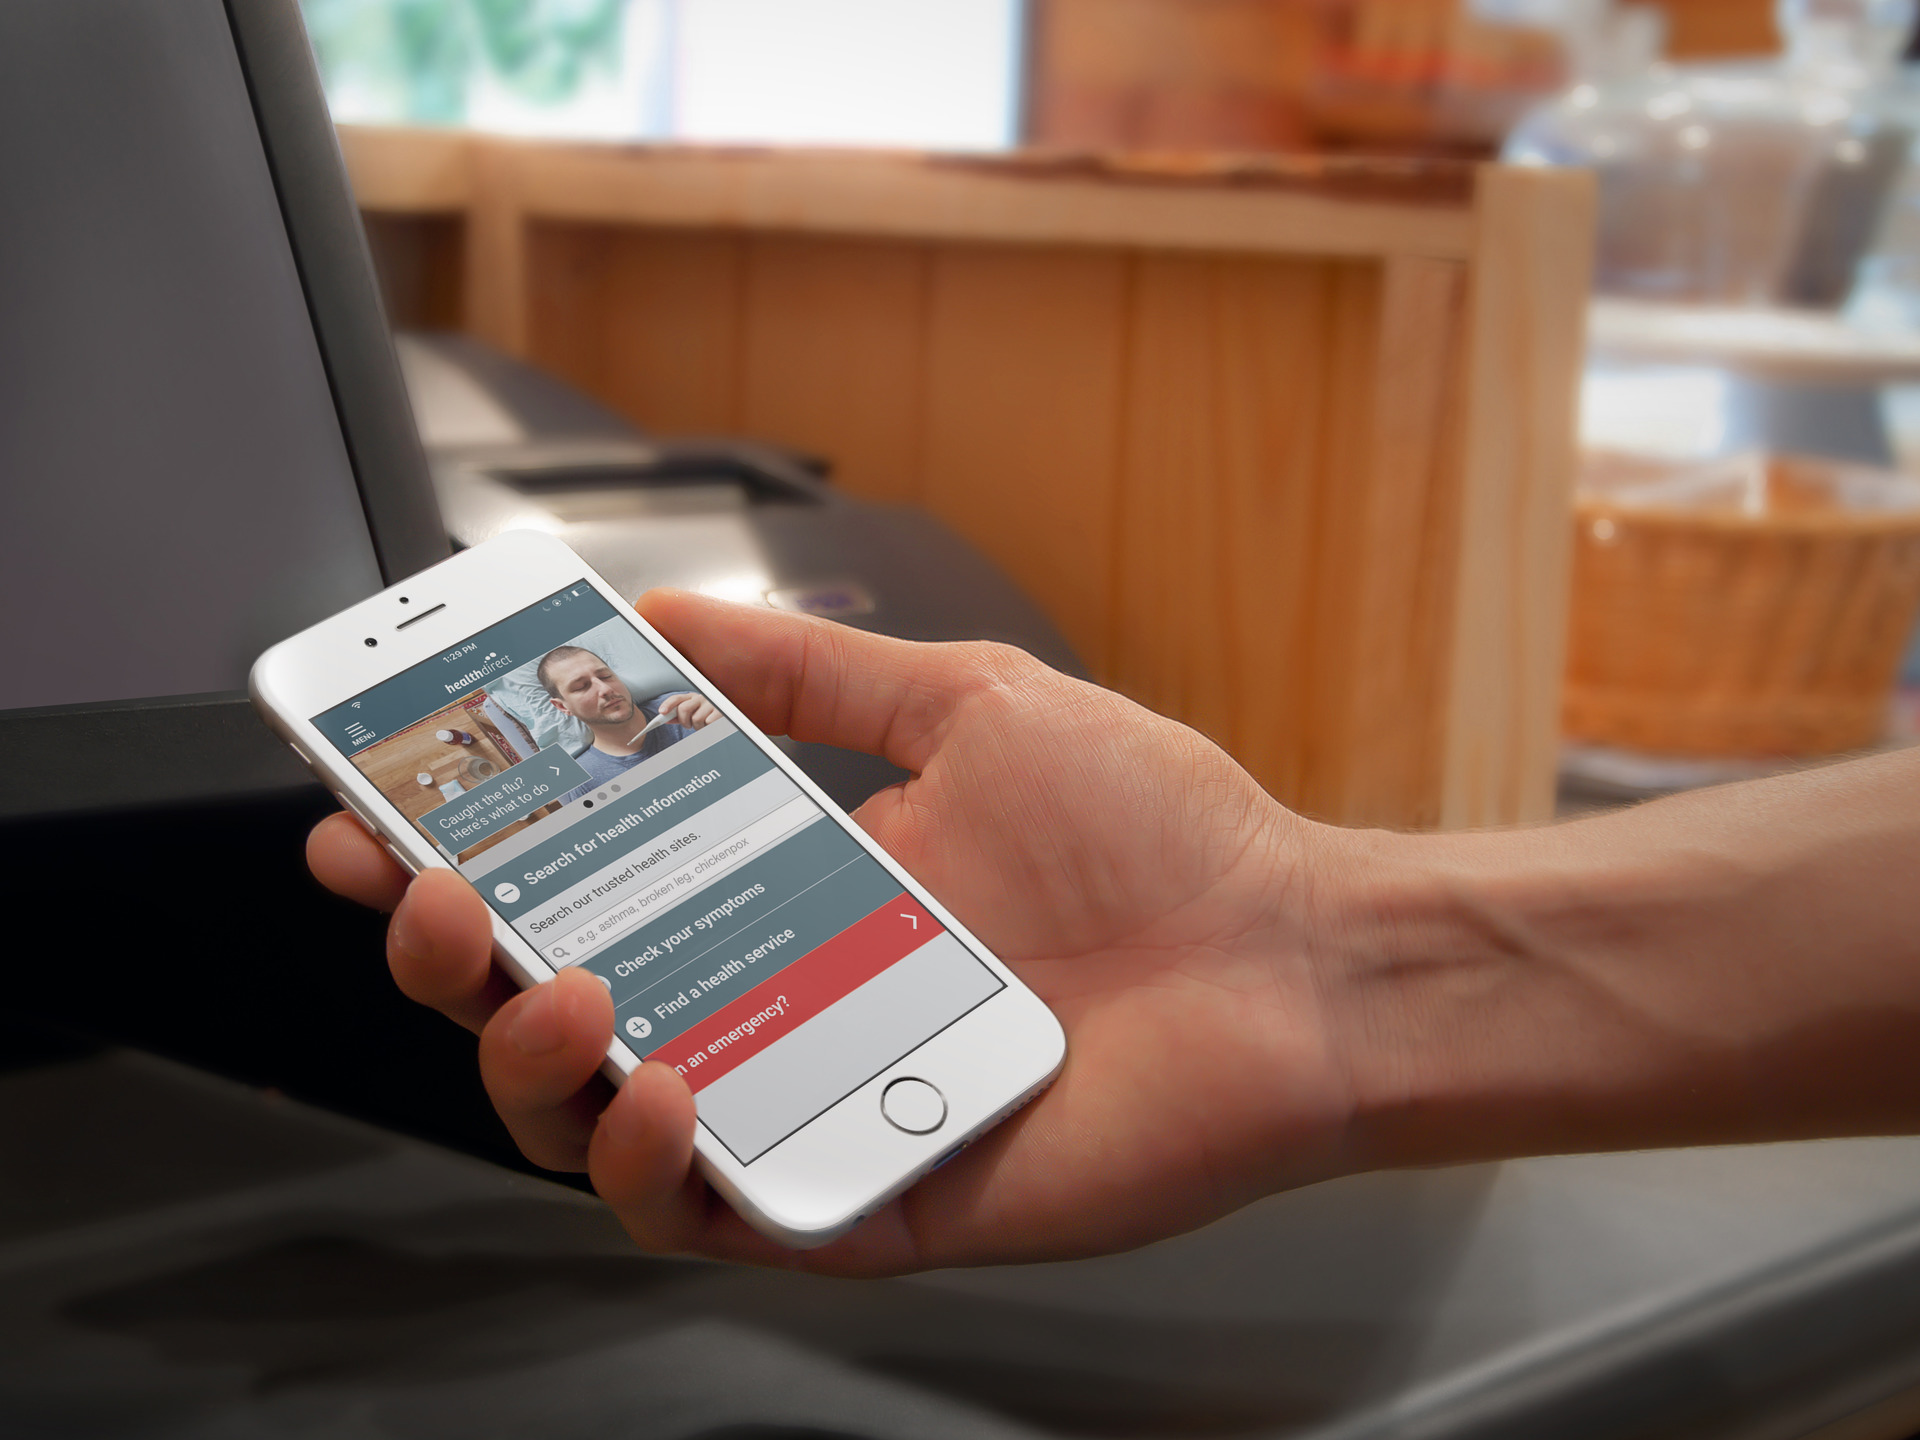 user viewing the healthdirect app